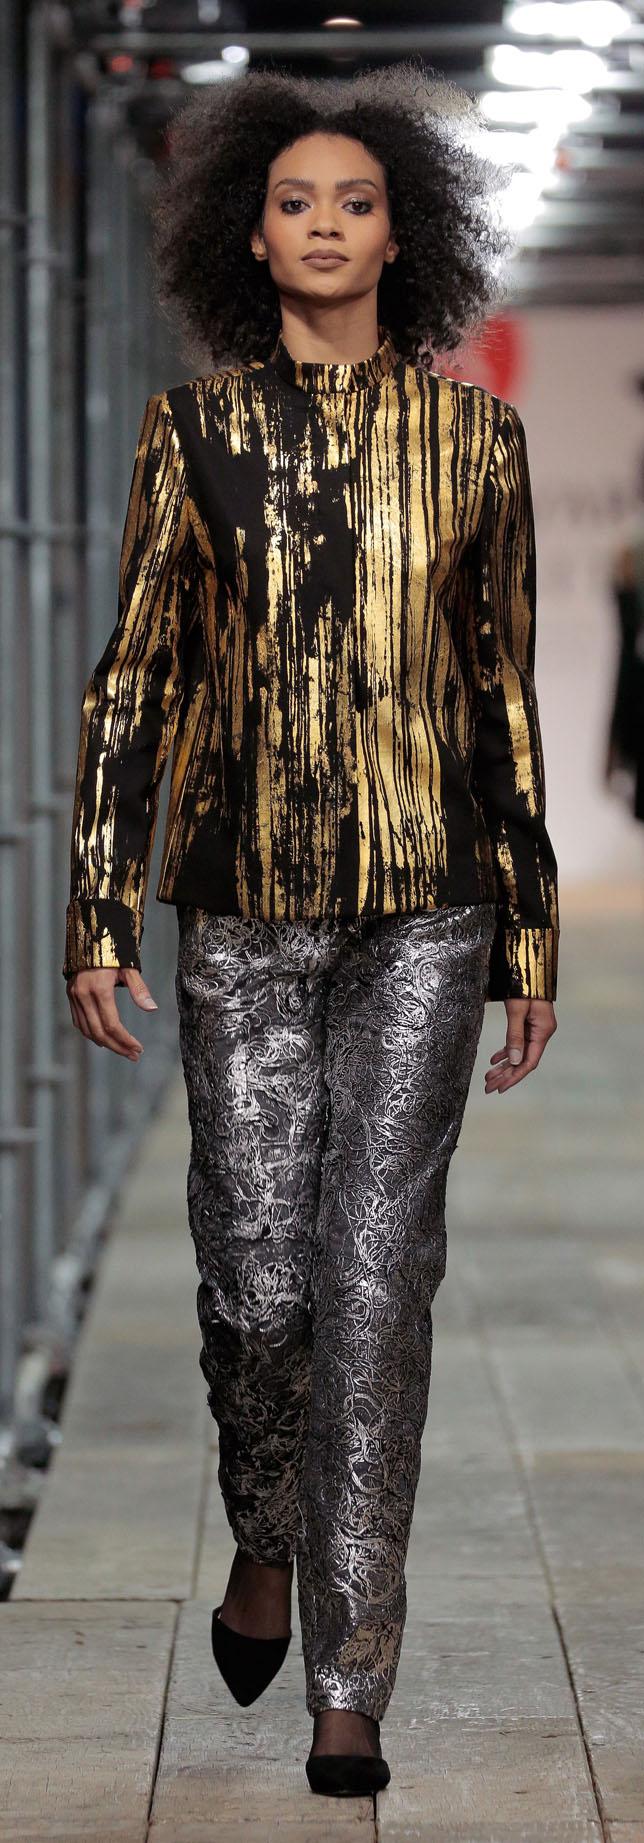 59_Denise Ramos, fashion design and Jorge Iglesias, textile design_CROPPED.jpg